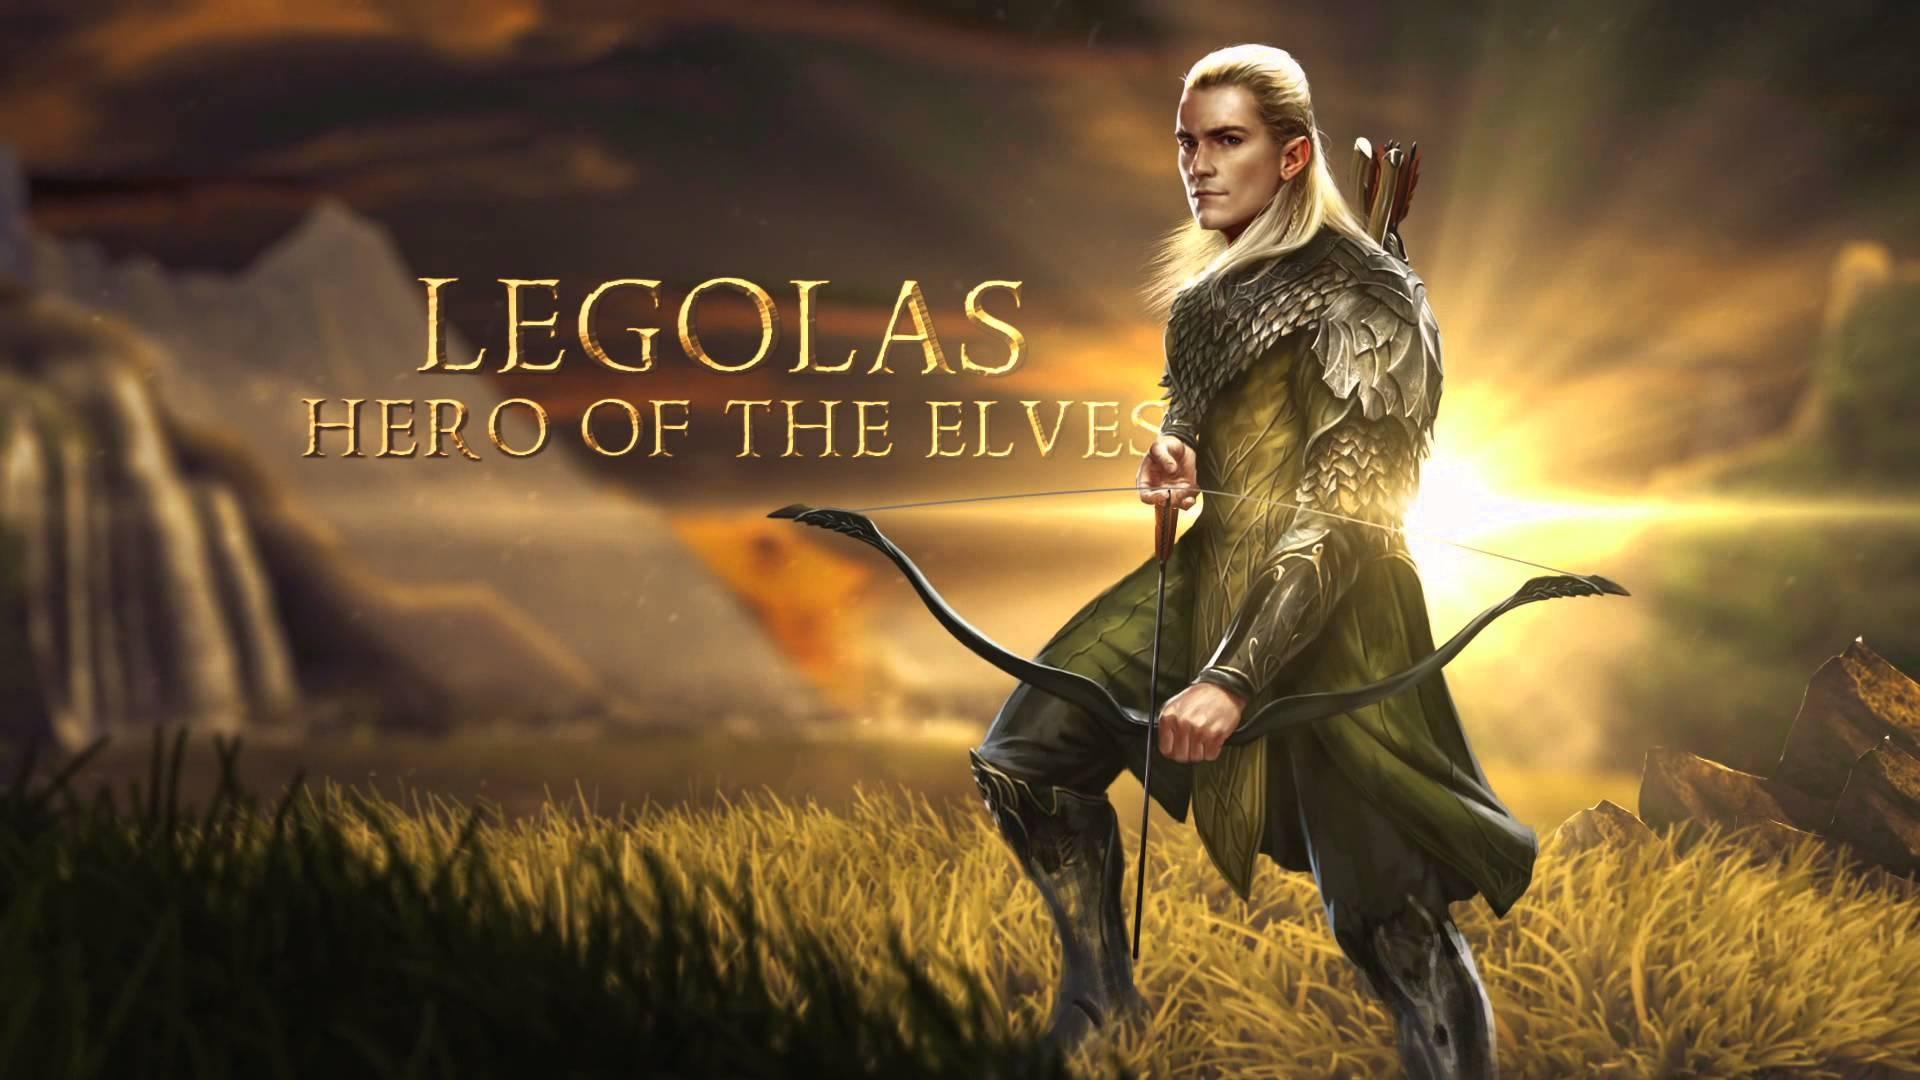 Legolas free image